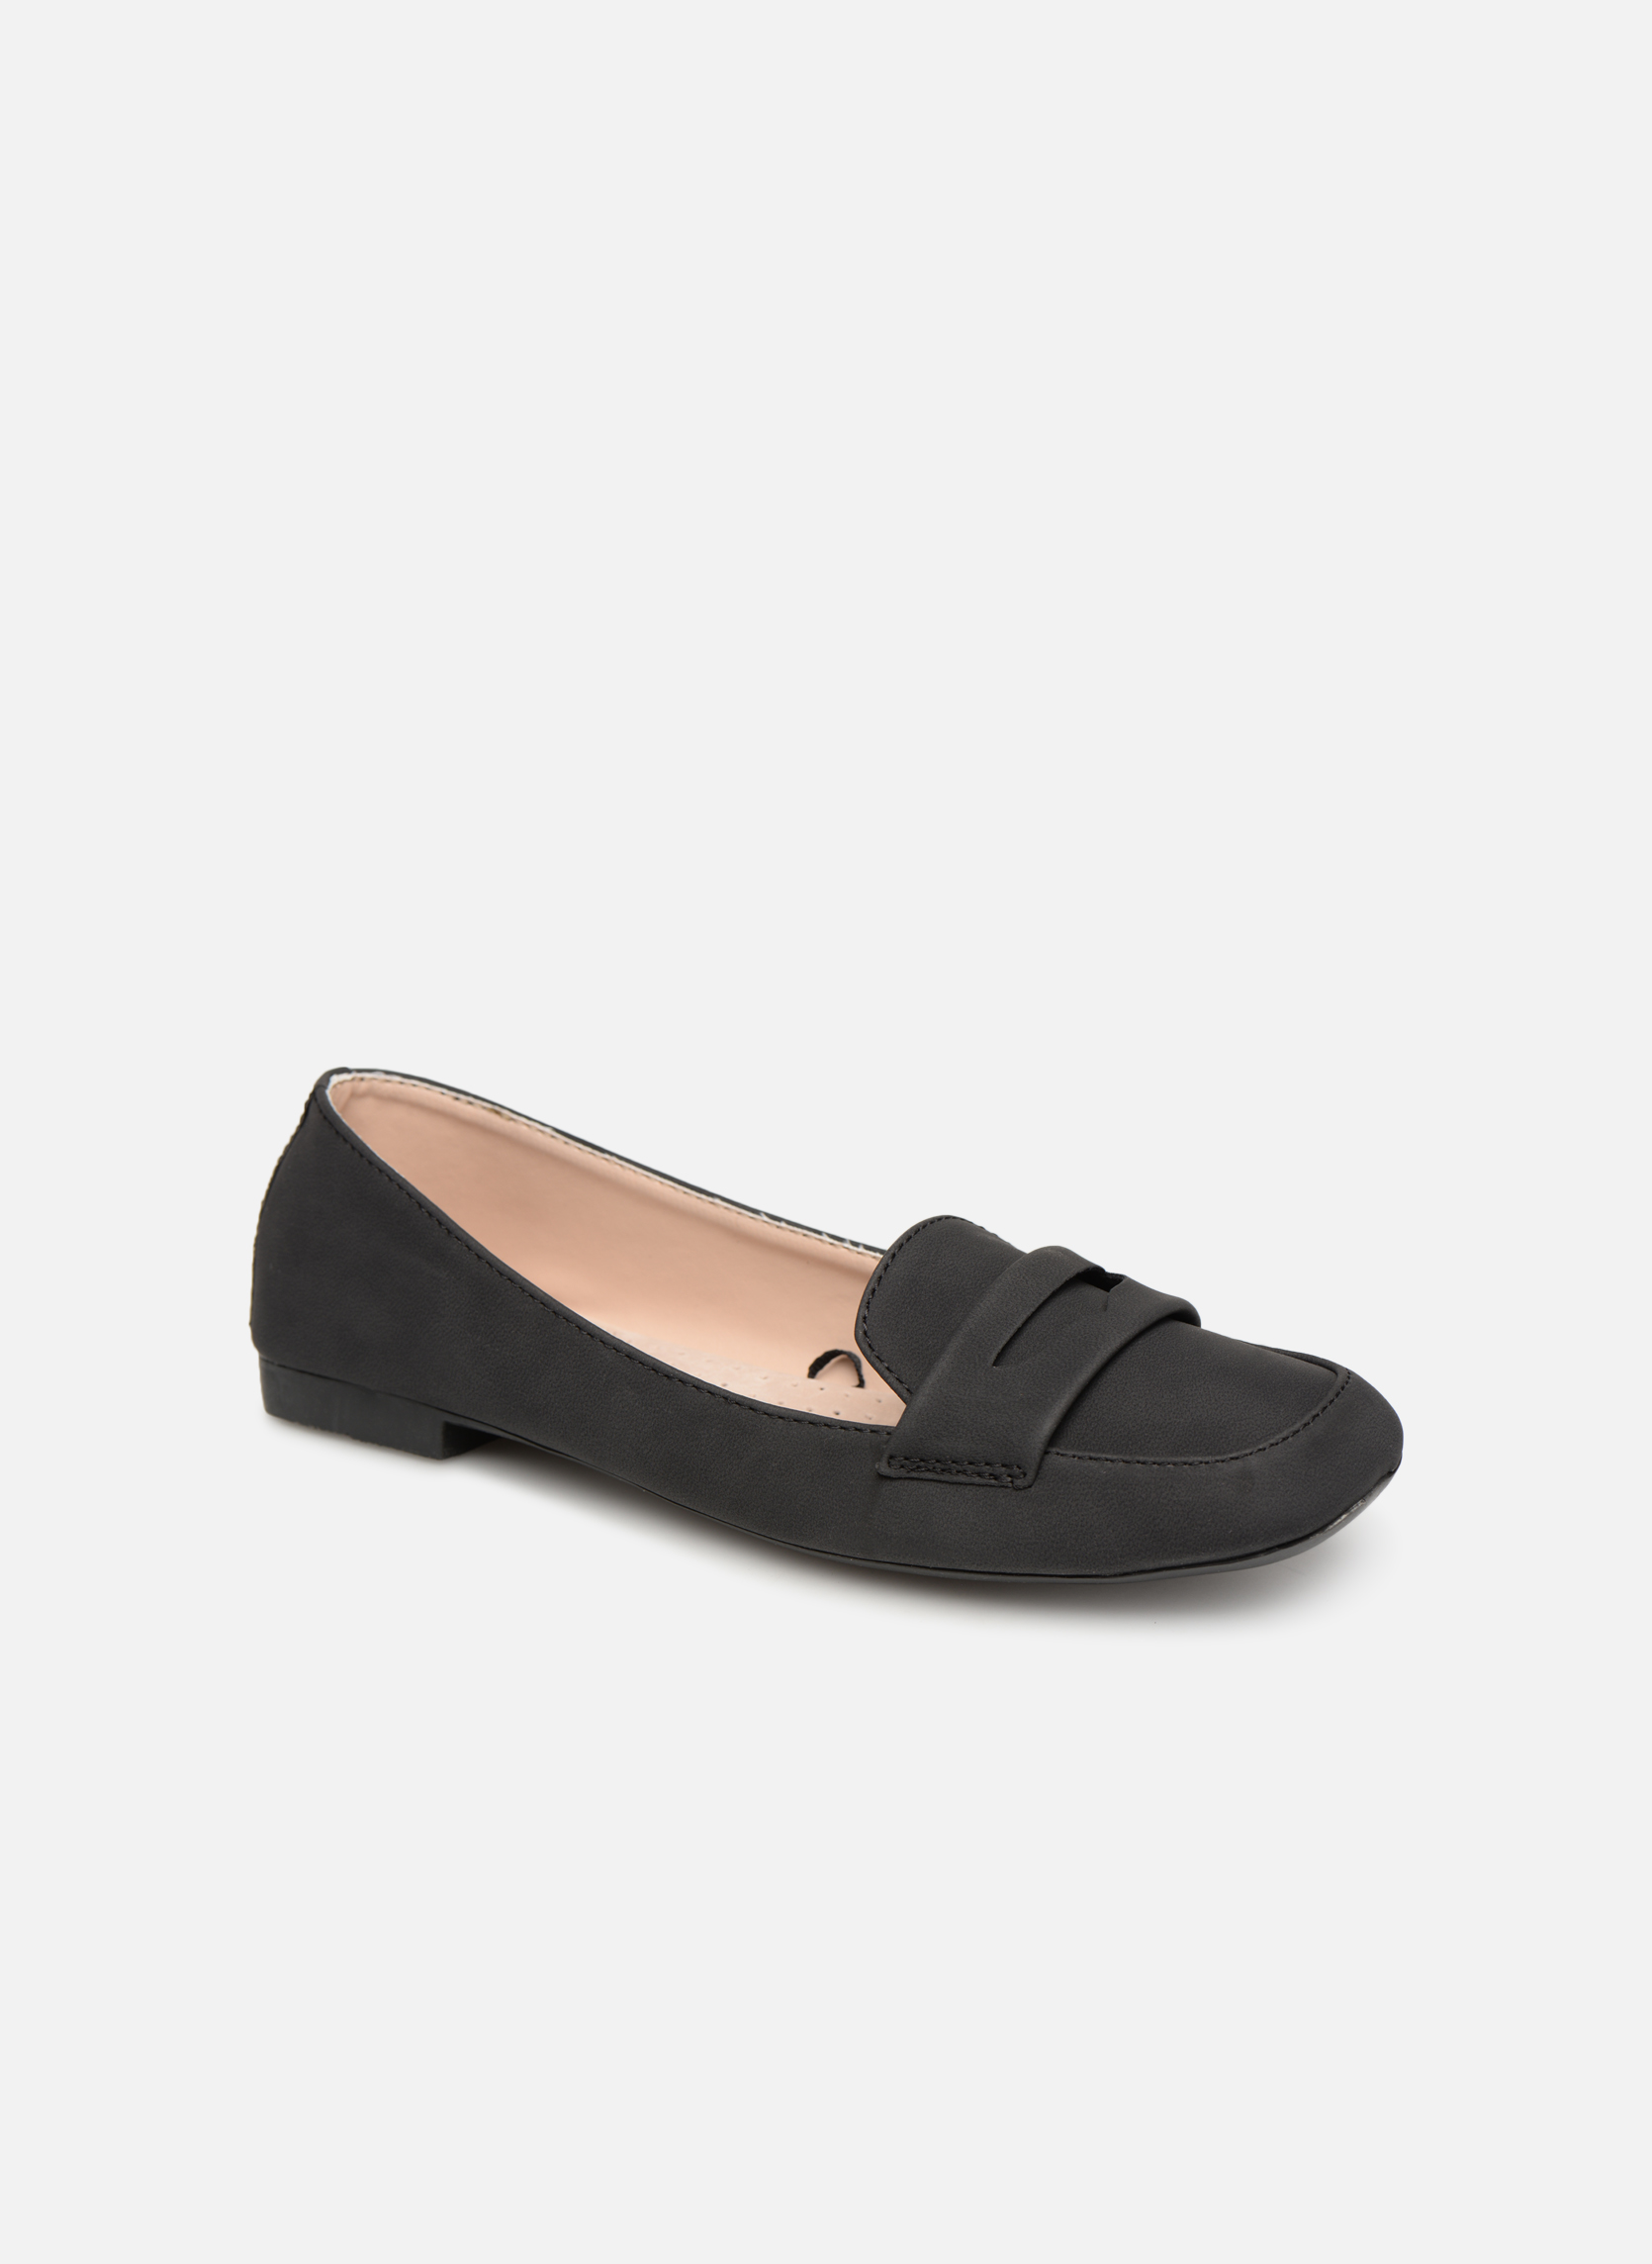 Slipper Isotoner Ballerines bout carré mocassin talon 1cm schwarz detaillierte ansicht/modell